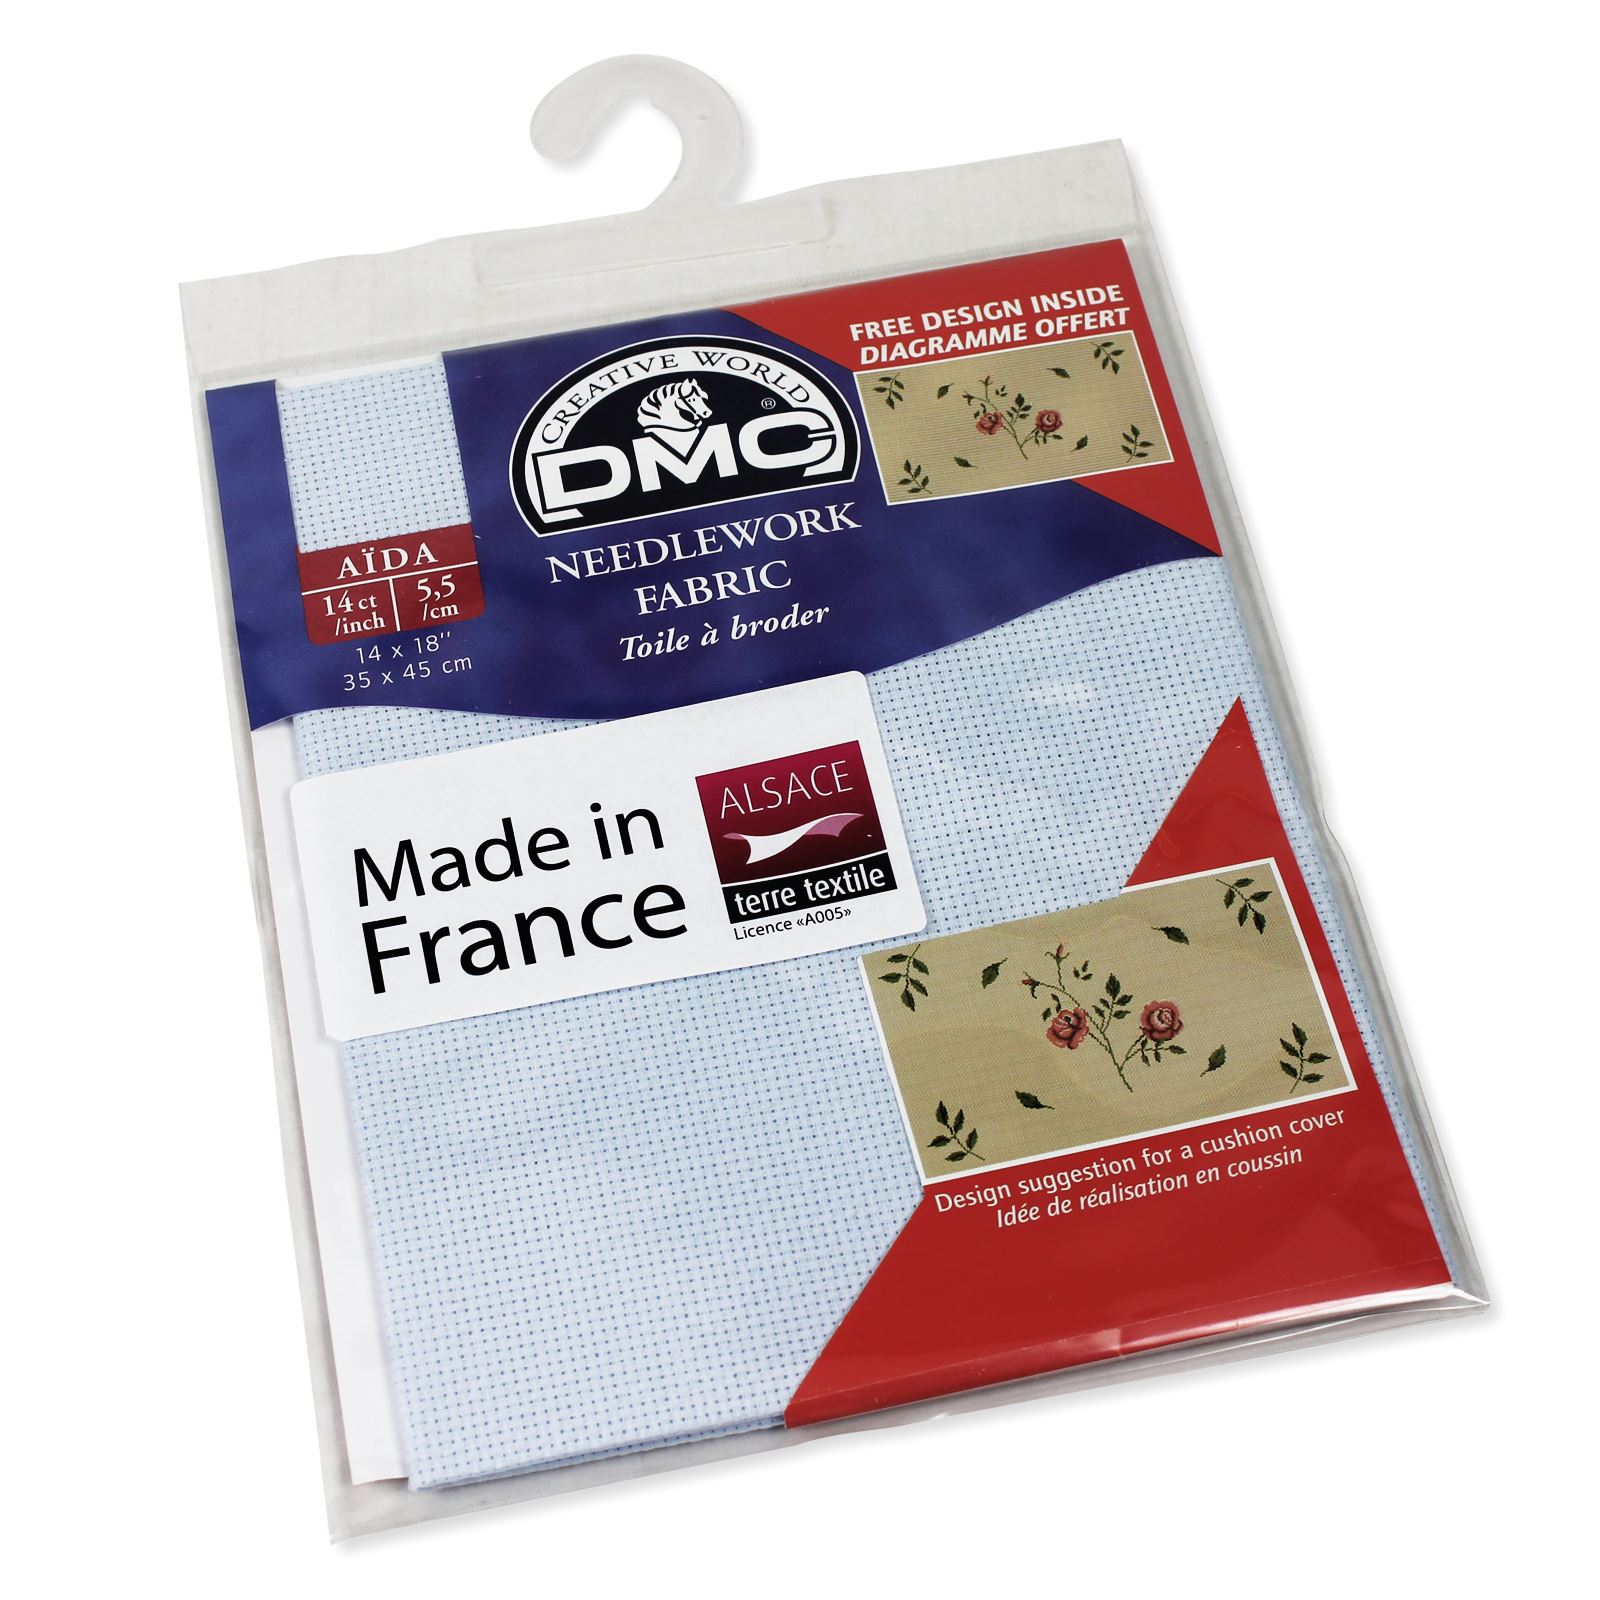 DMC-Aida-Needlework-Fabric-Cross-Stitch-Canvas-Material